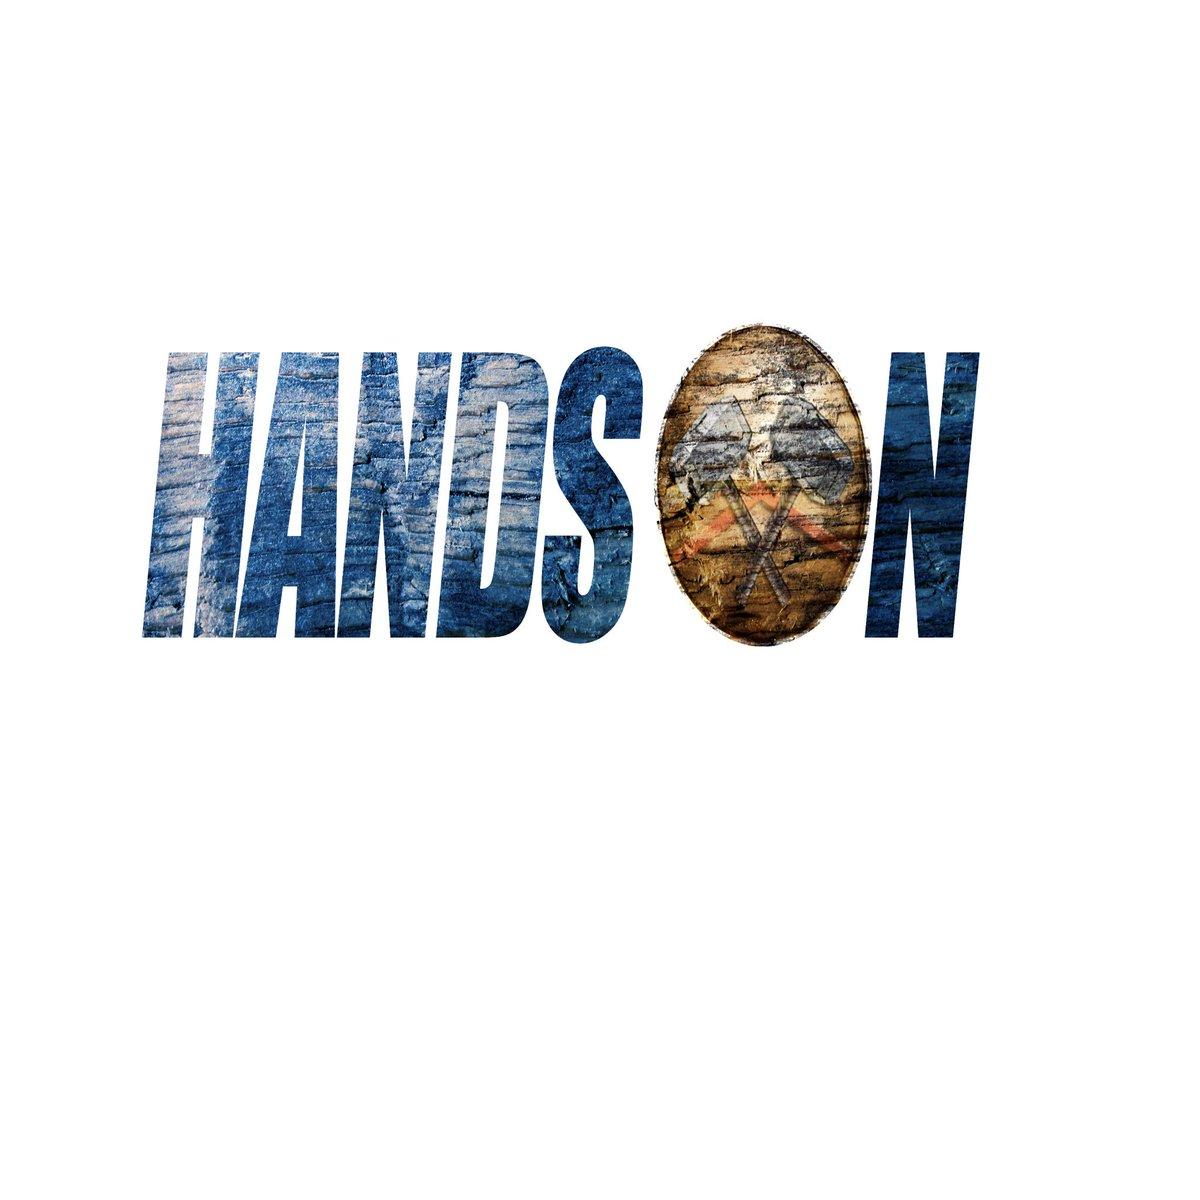 Episode 4 of #thehandsonpodcast just uploaded onto iTunes.https://t.co/mshe78xjoa https://t.co/sWuPP6cv1V